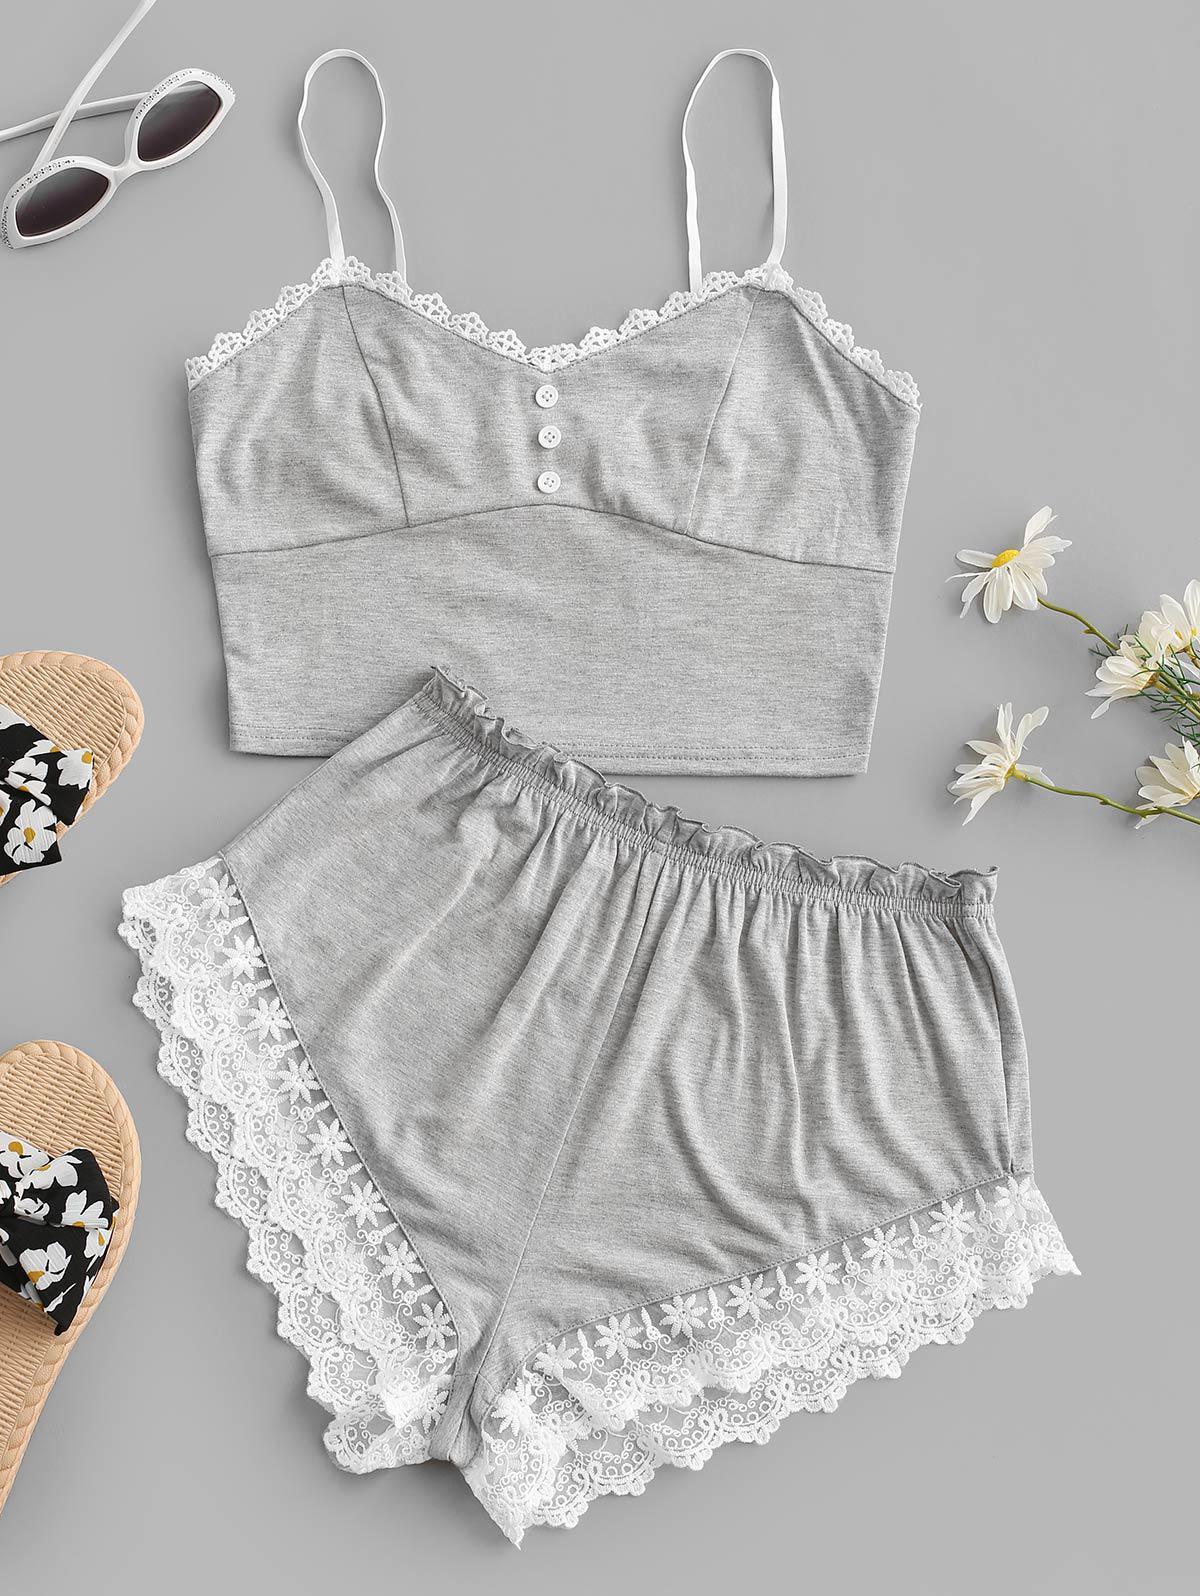 zaful Lace Panel Button Embellished Shorts Set